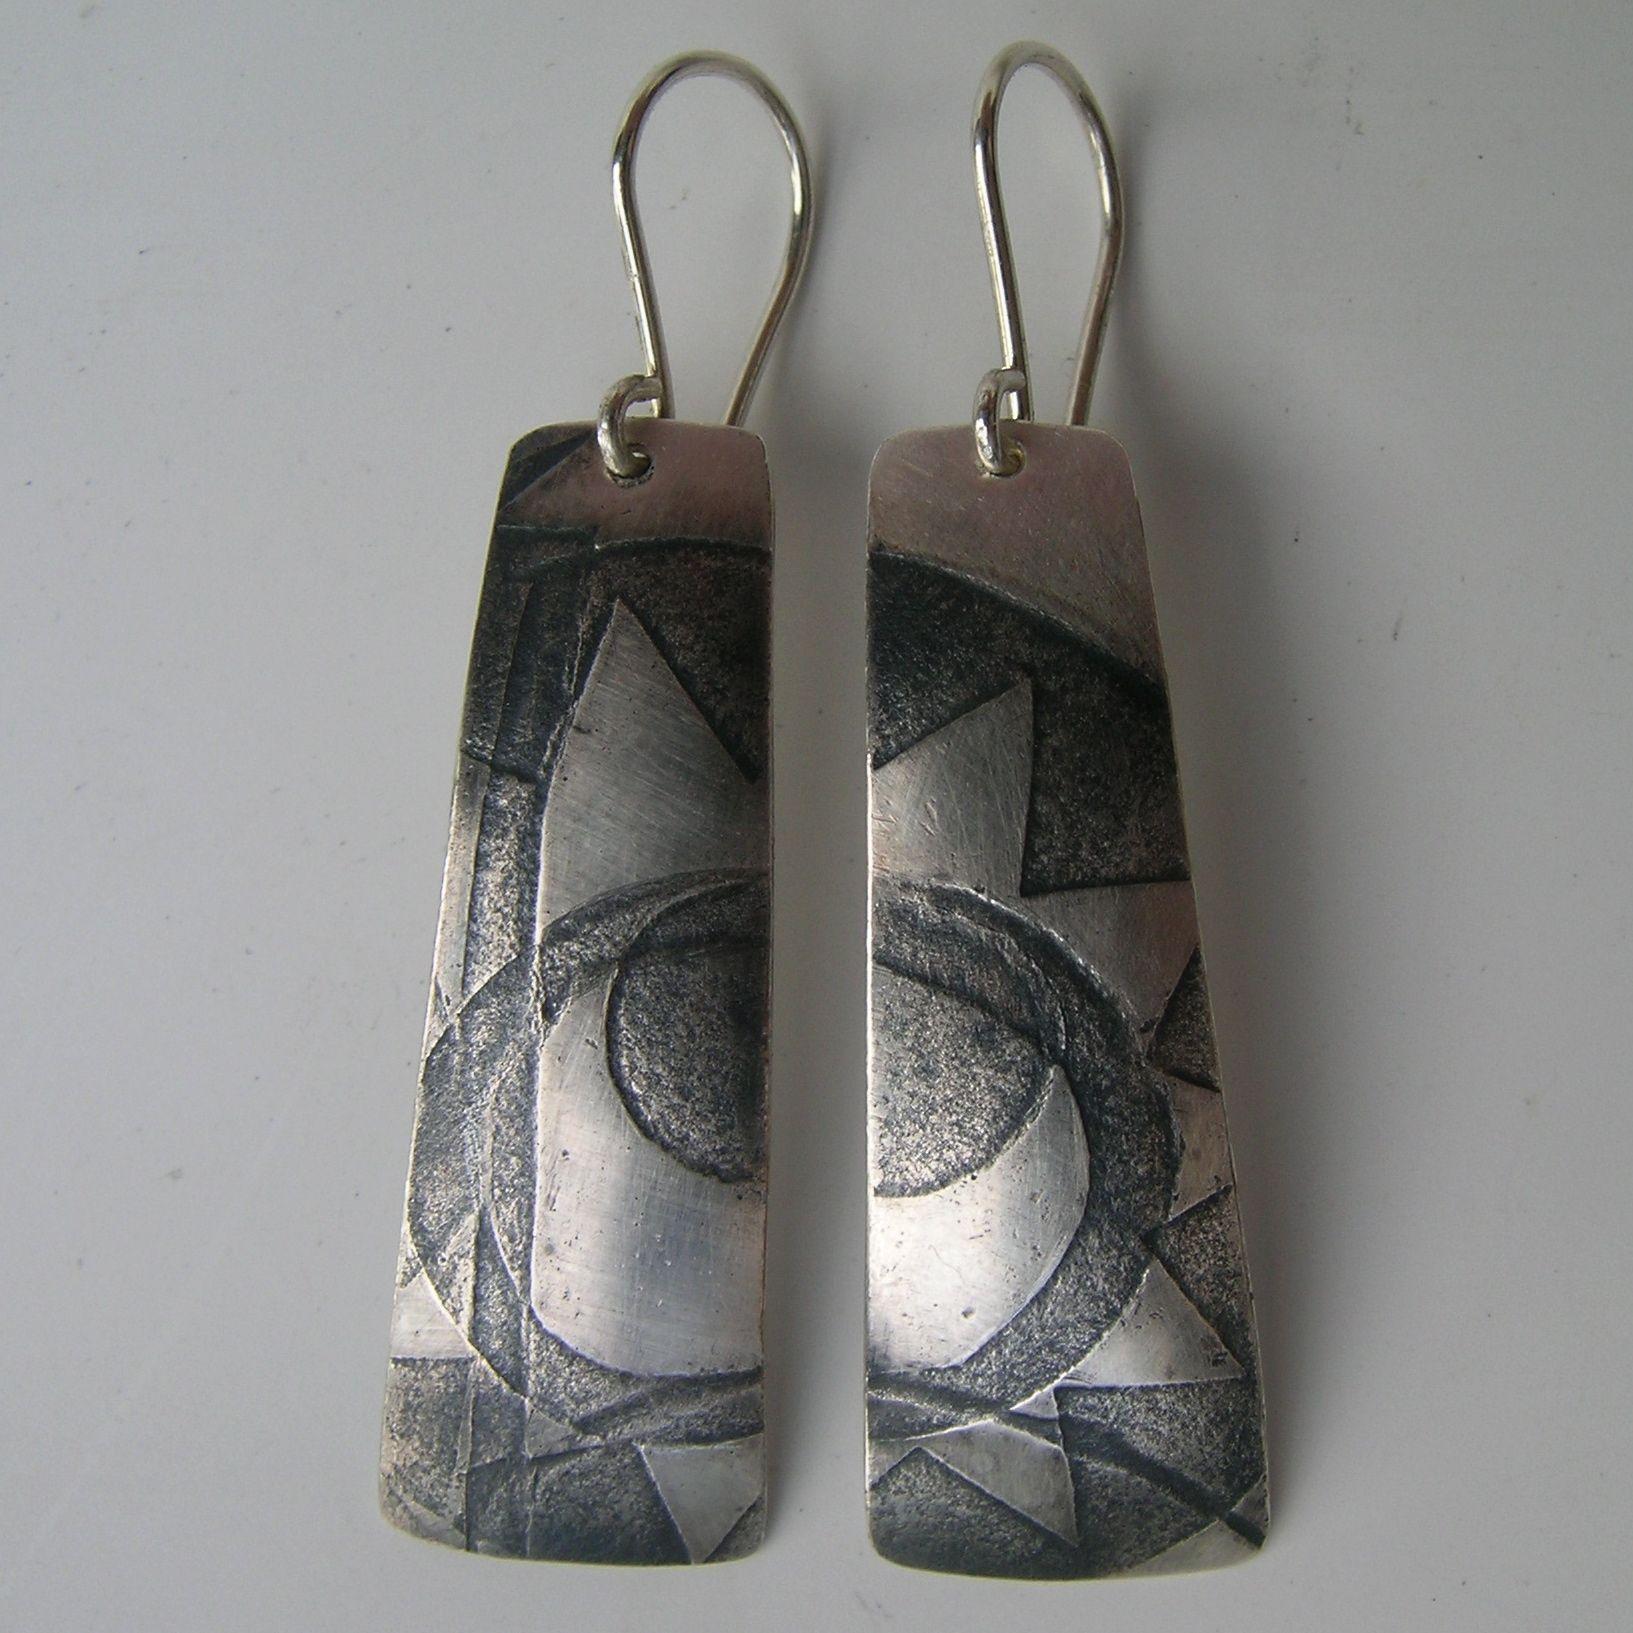 Block Print drop earrings | Contemporary Earrings by contemporary jewellery designer Jessica Briggs